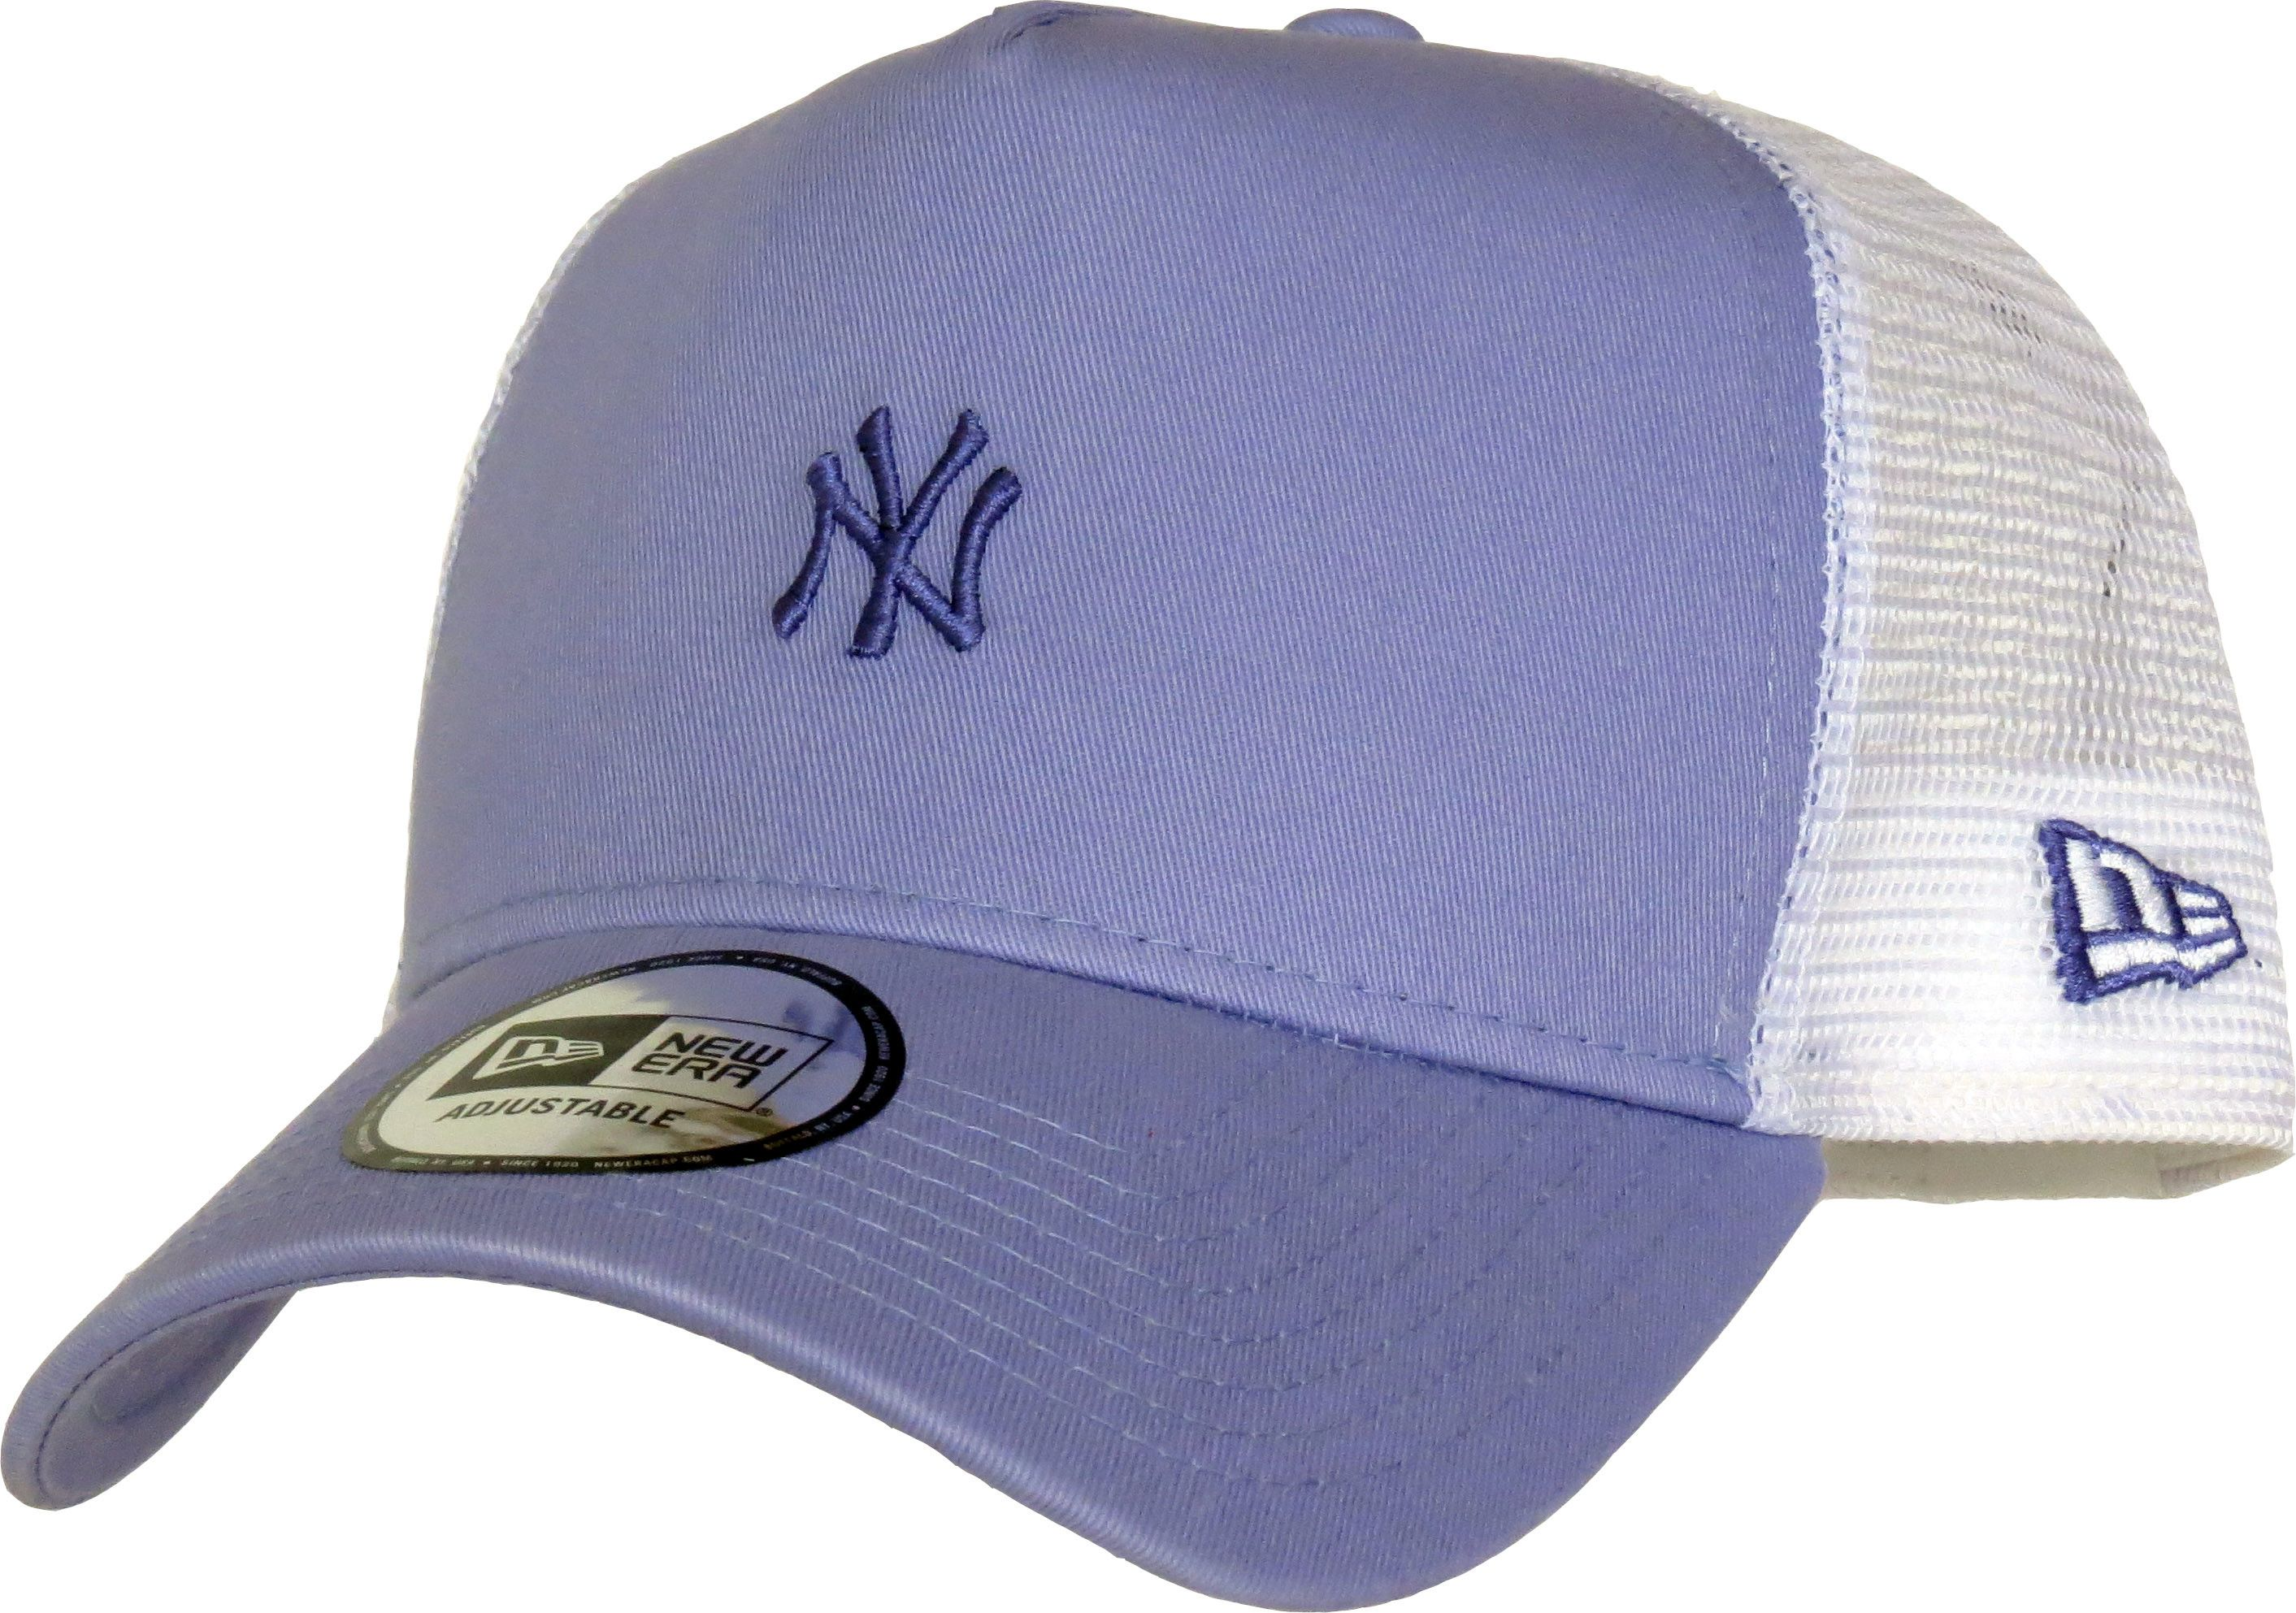 53da4a13d67 ... baseball caps by pumpheadgear. New Era Womens NY Mini Logo Pastel  Trucker Cap. Pastel Purple